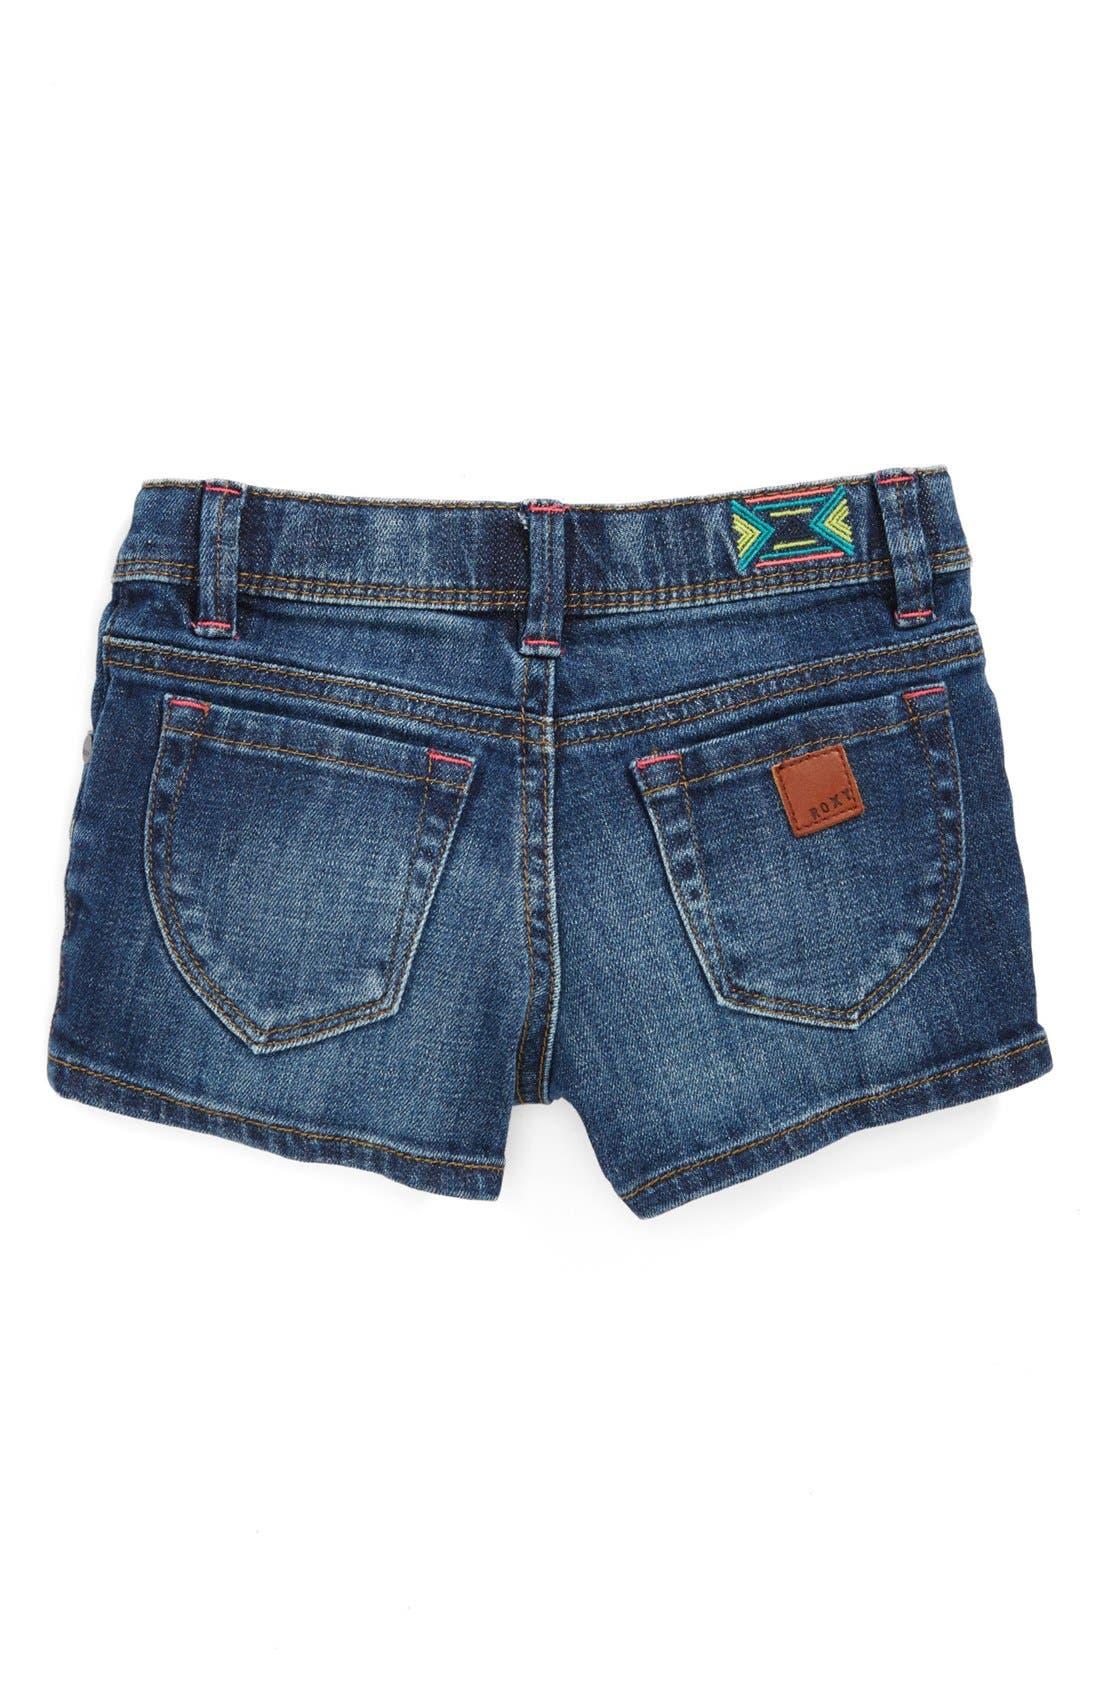 Alternate Image 2  - Roxy 'Lisy' Shorts (Toddler Girls)